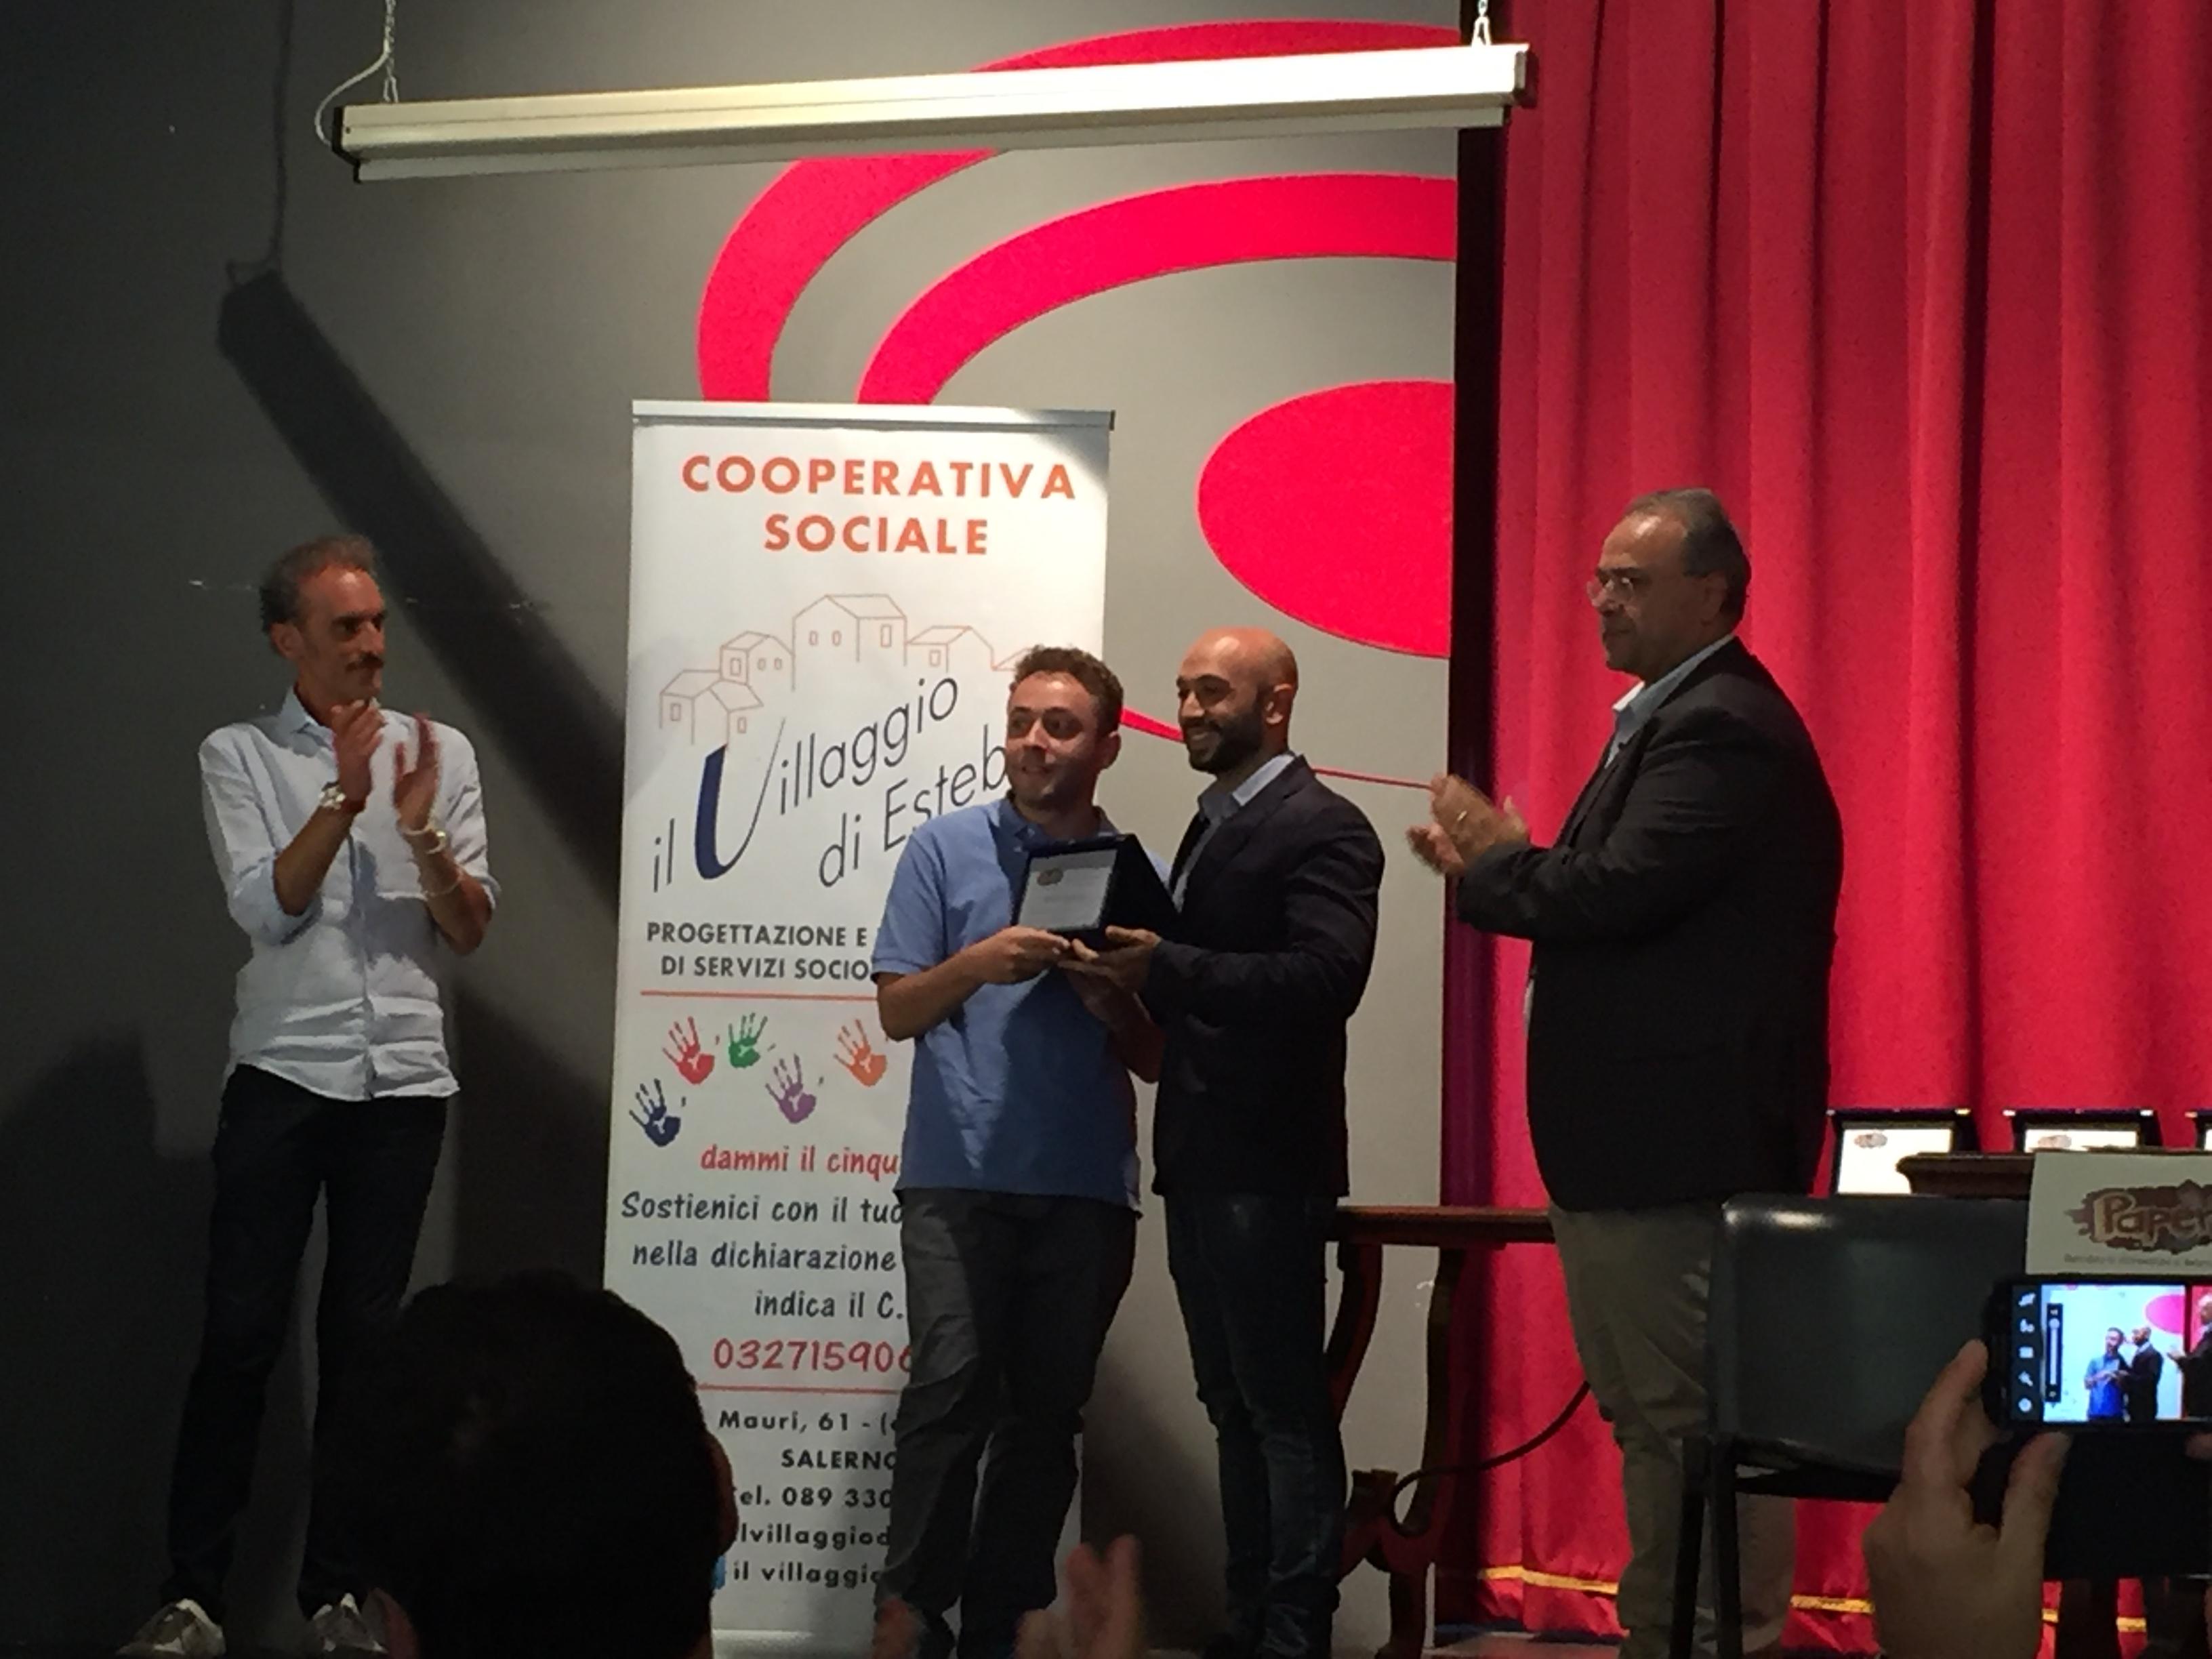 Sezione Social Media - Marco Raritá